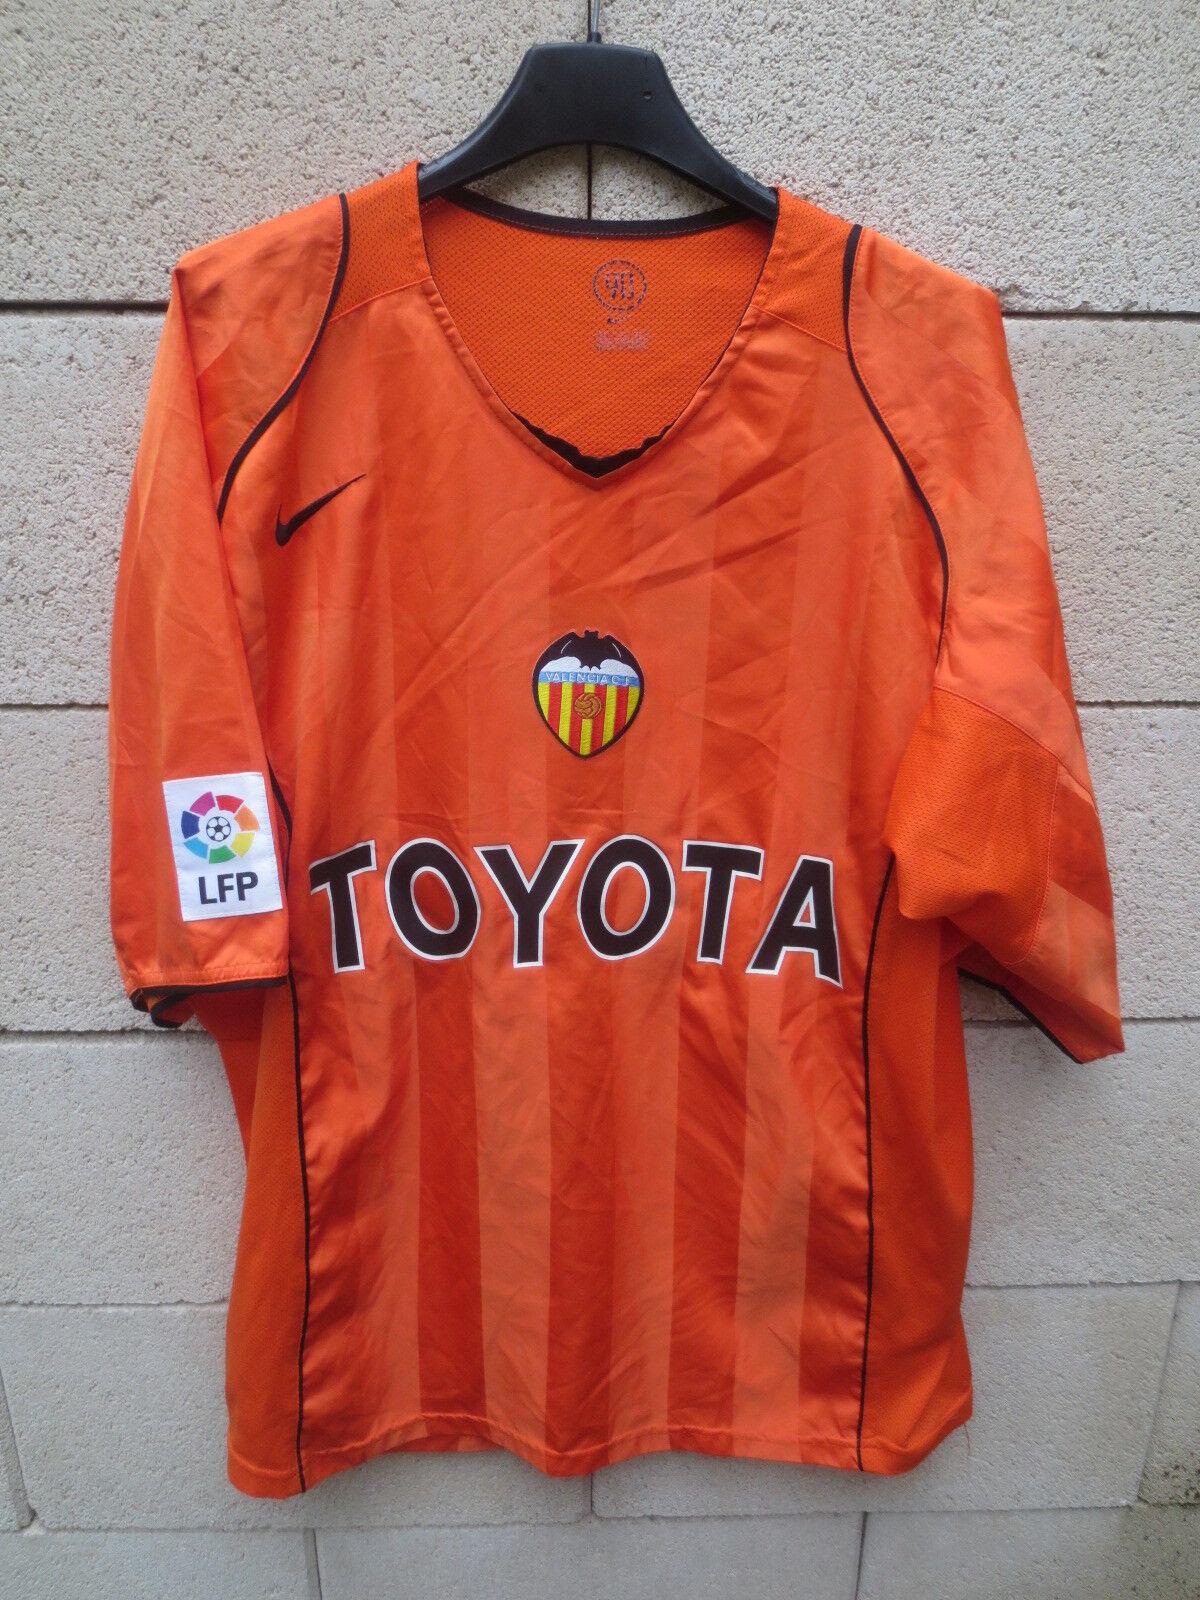 02a63440a Maillot VALENCE VALENCIA 2005 2005 2005 away shirt jersey camiseta NIKE  orange football XL d684df